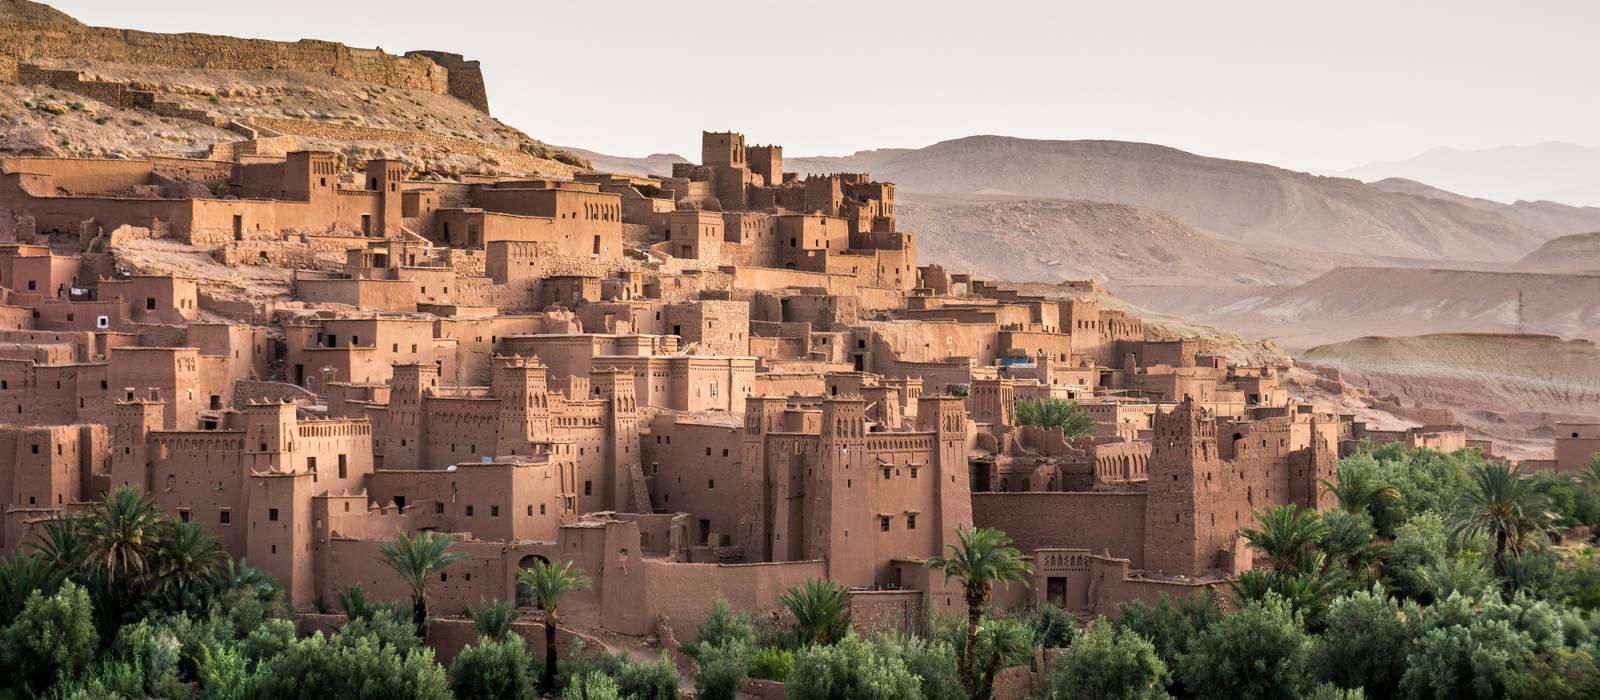 Ait Benhaddou Kasbah im Morgengrauen, Hoher Atlas-Gebirge, Marokko, Afrika